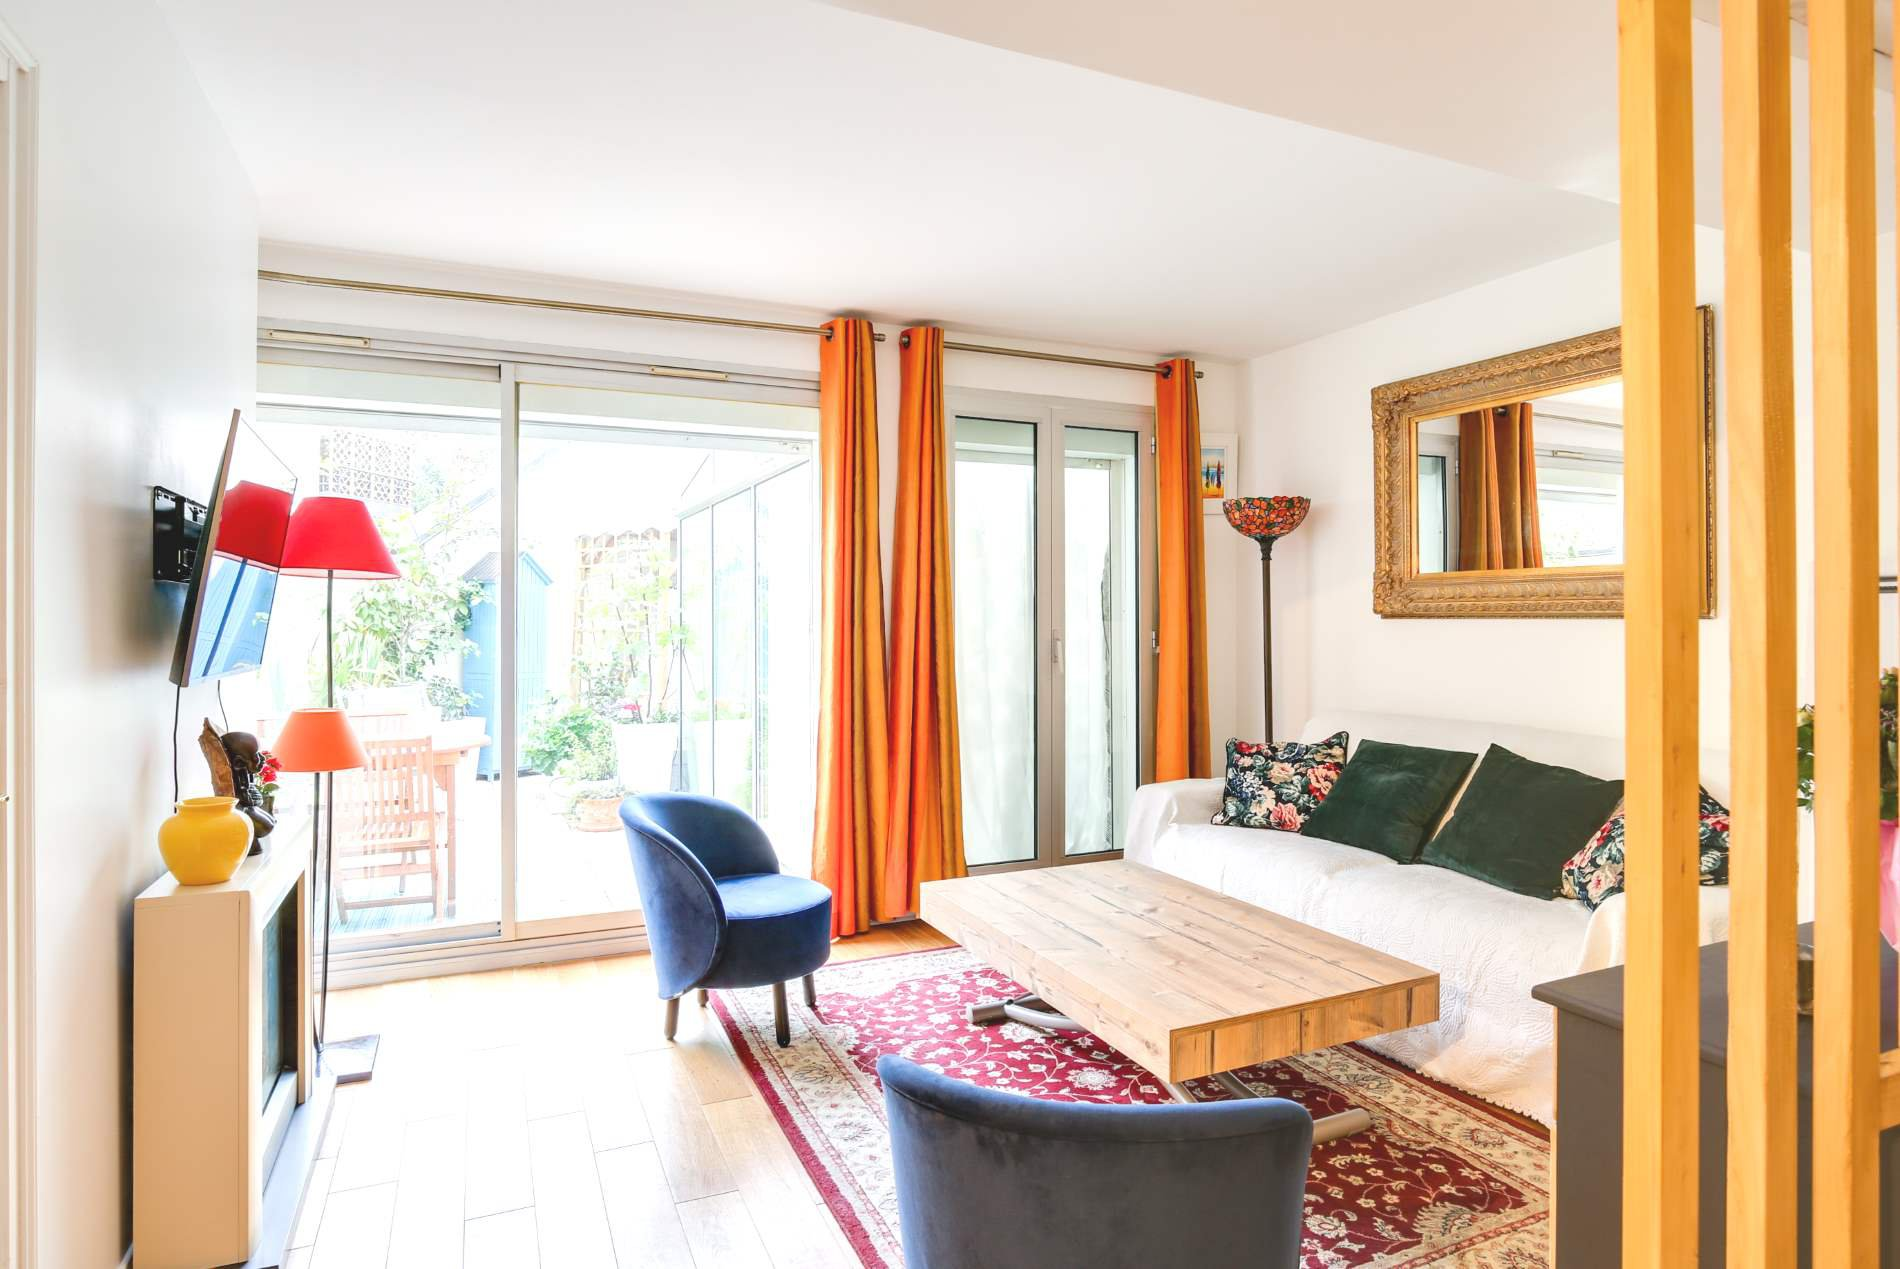 propriétaire airbnb et hote airbnb